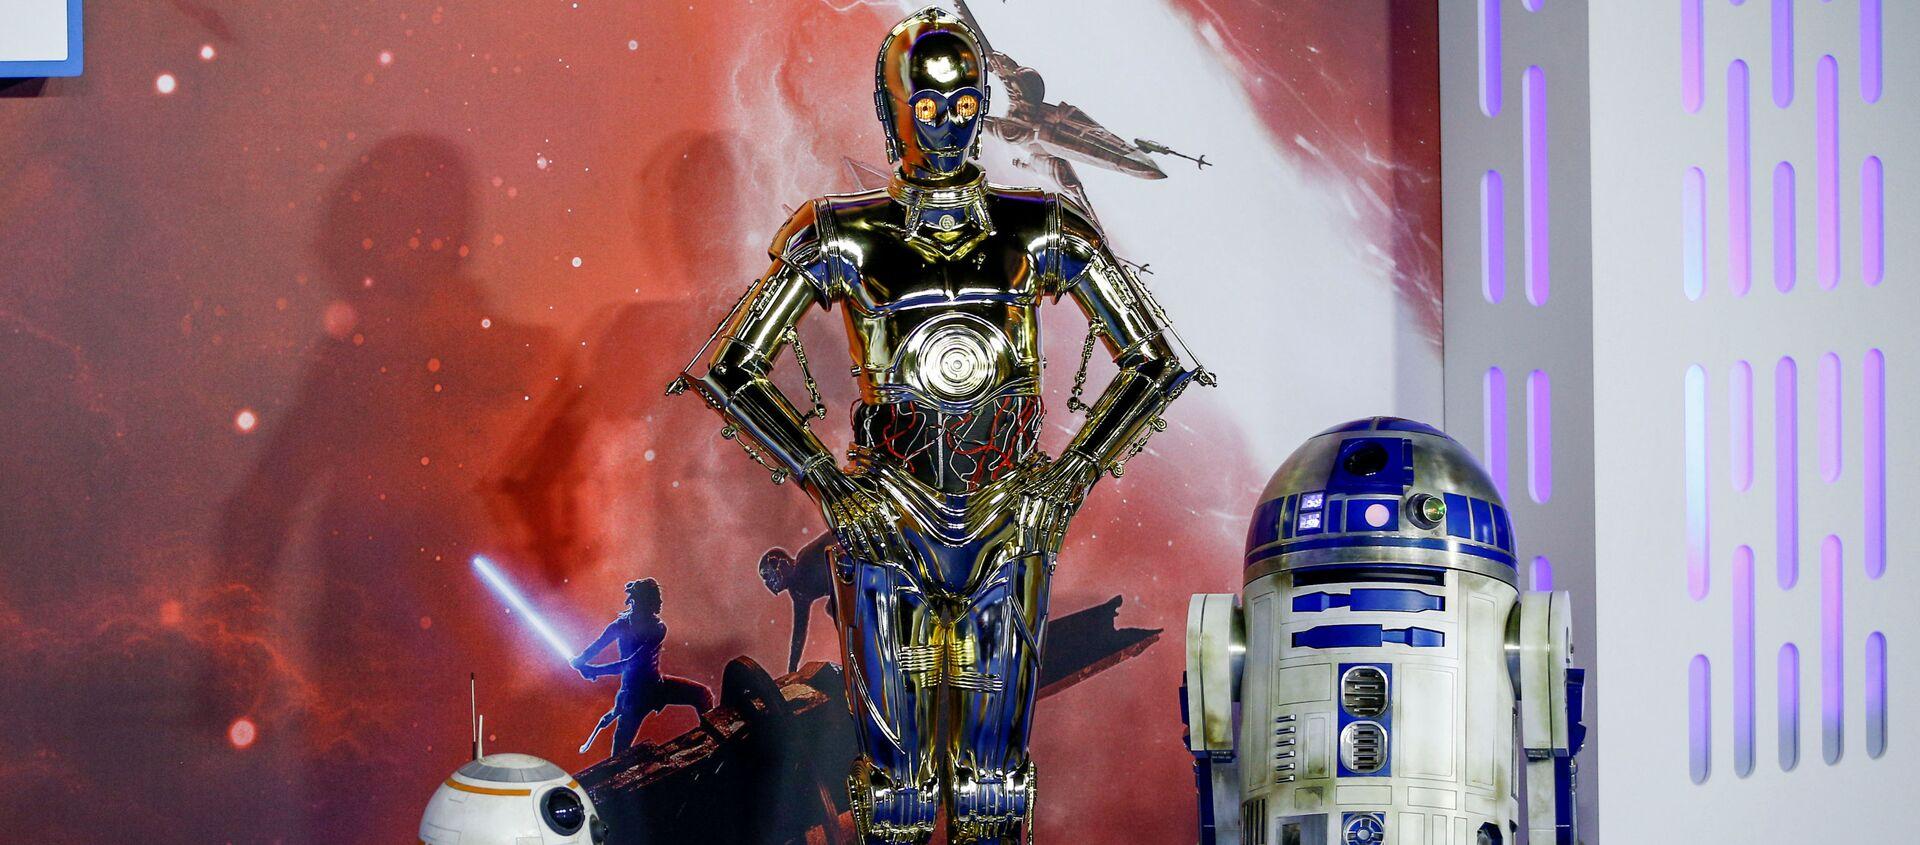 Los droides de 'Star Wars' saga D-O, R2D2 y C3PO - Sputnik Mundo, 1920, 11.12.2020